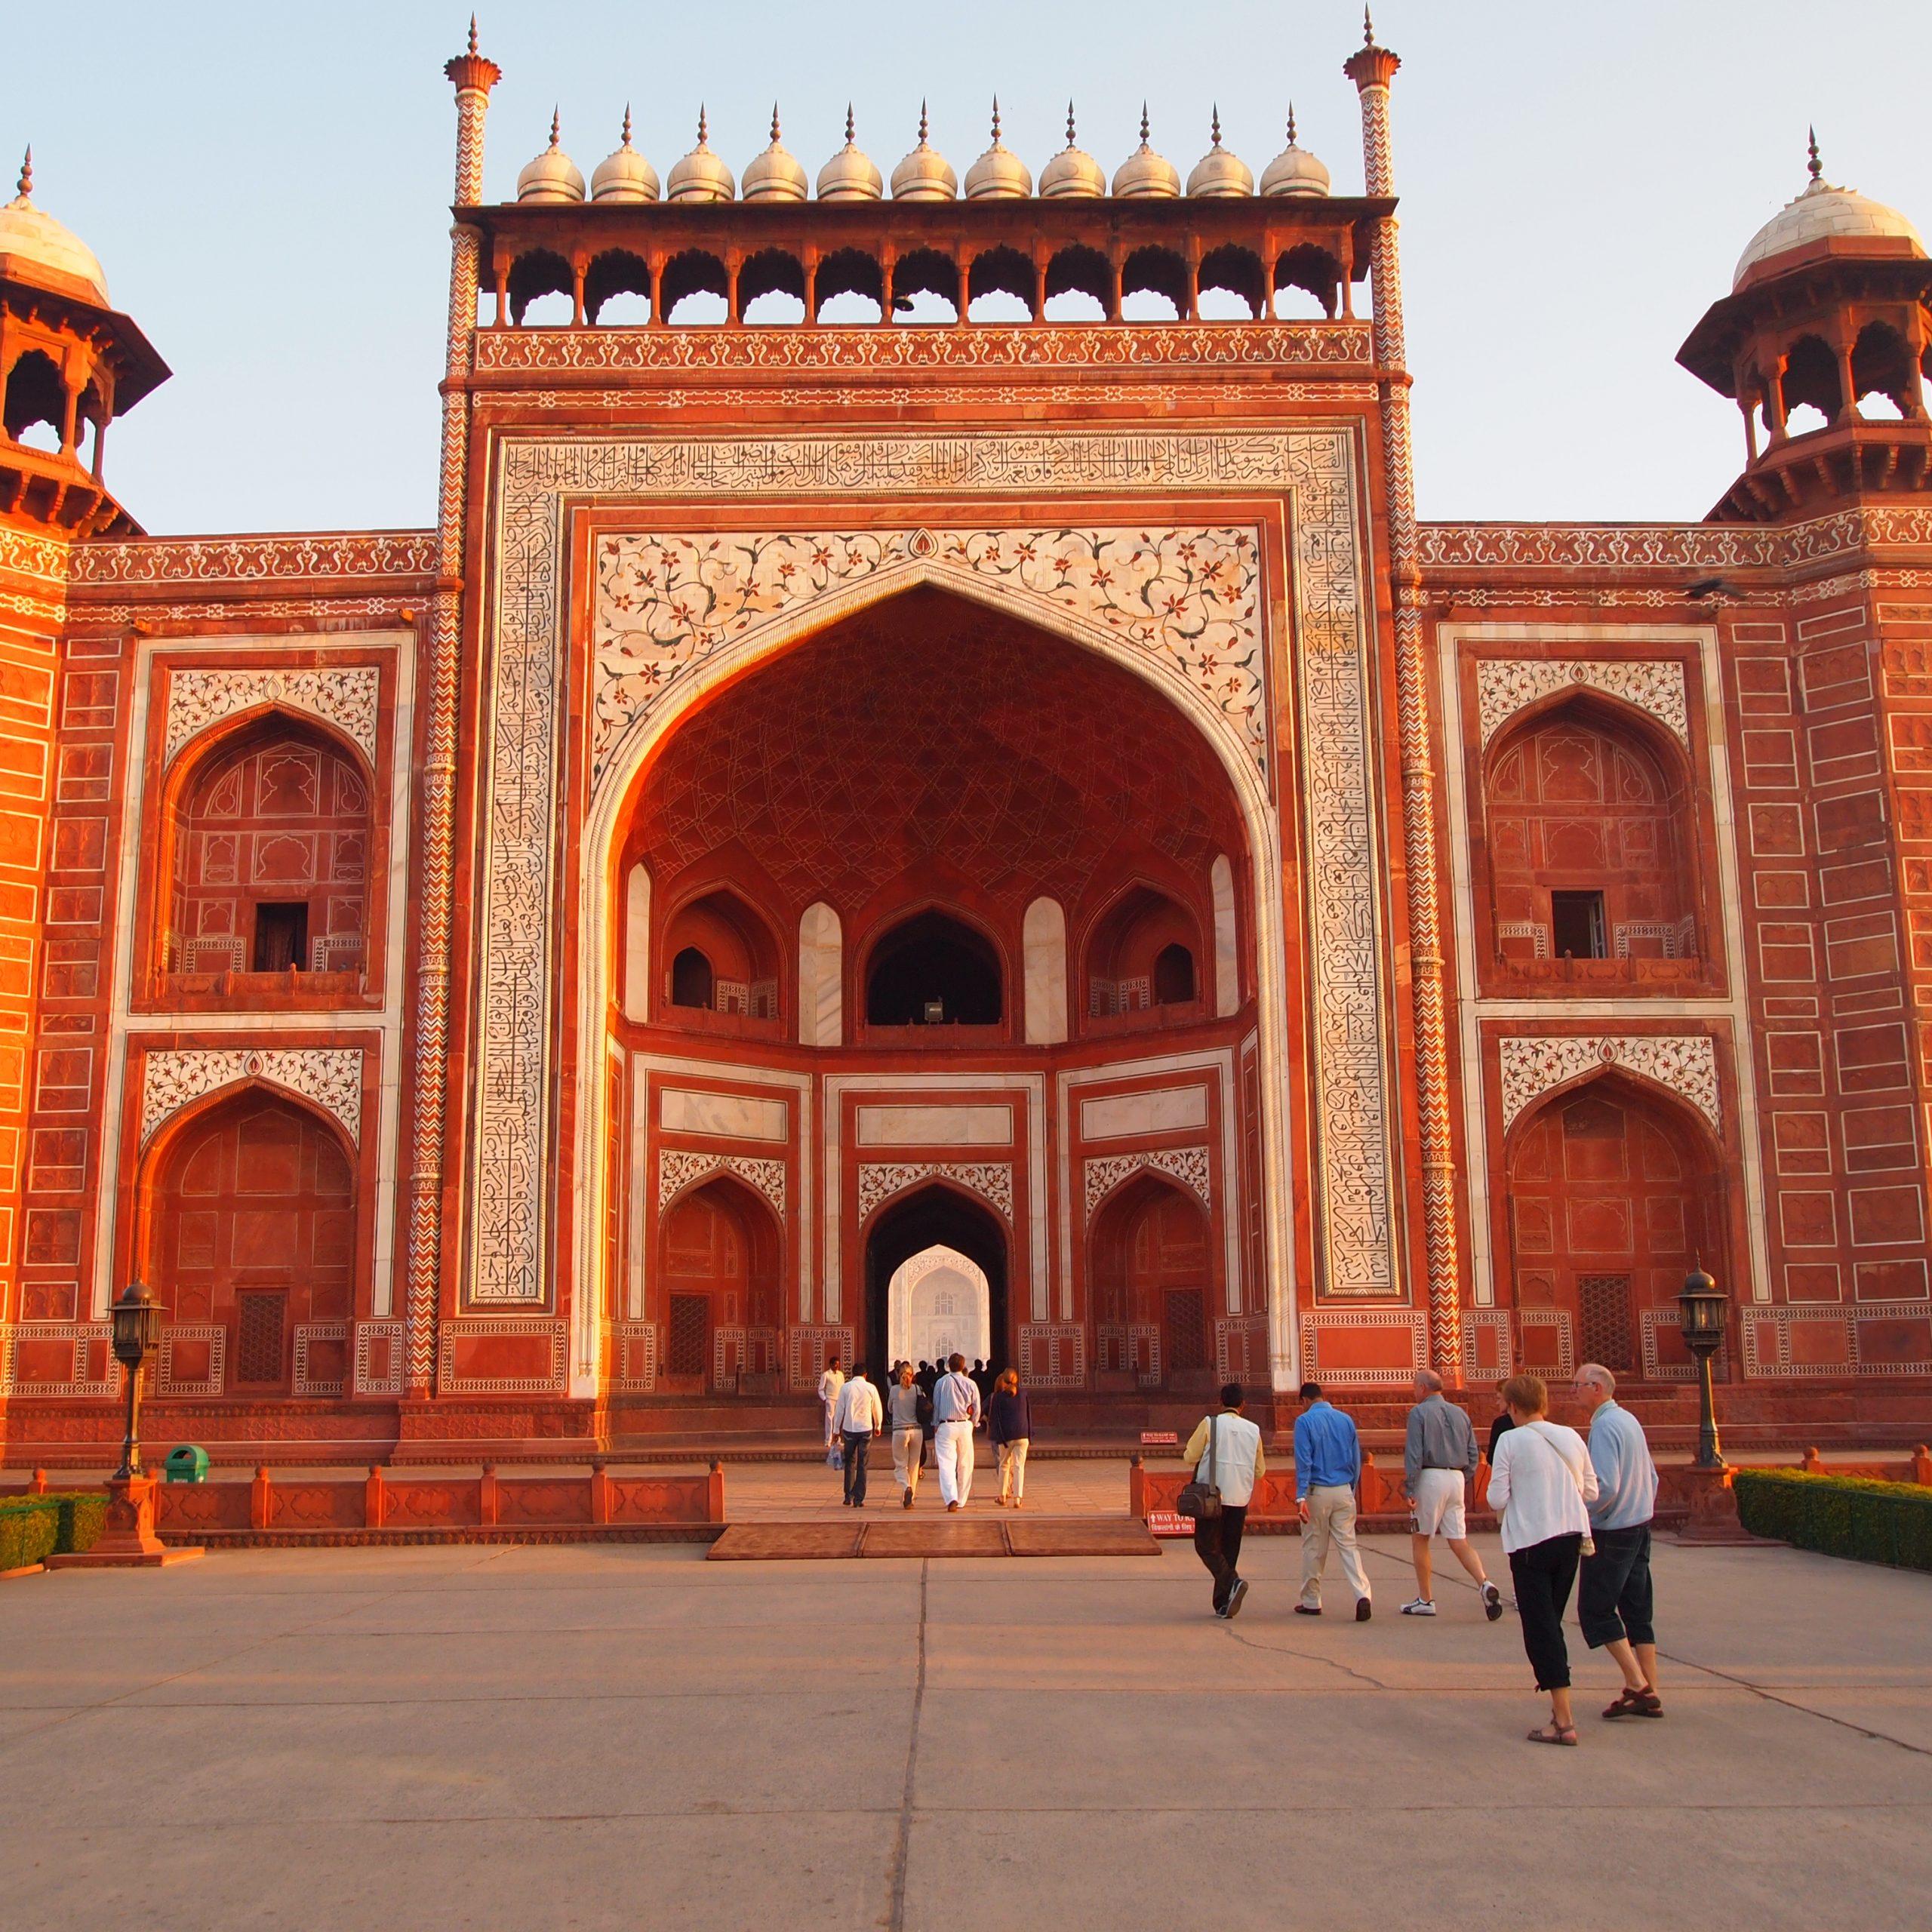 Jour 7 : Jaipur - Fathepur sikri - Agra (240 KM)